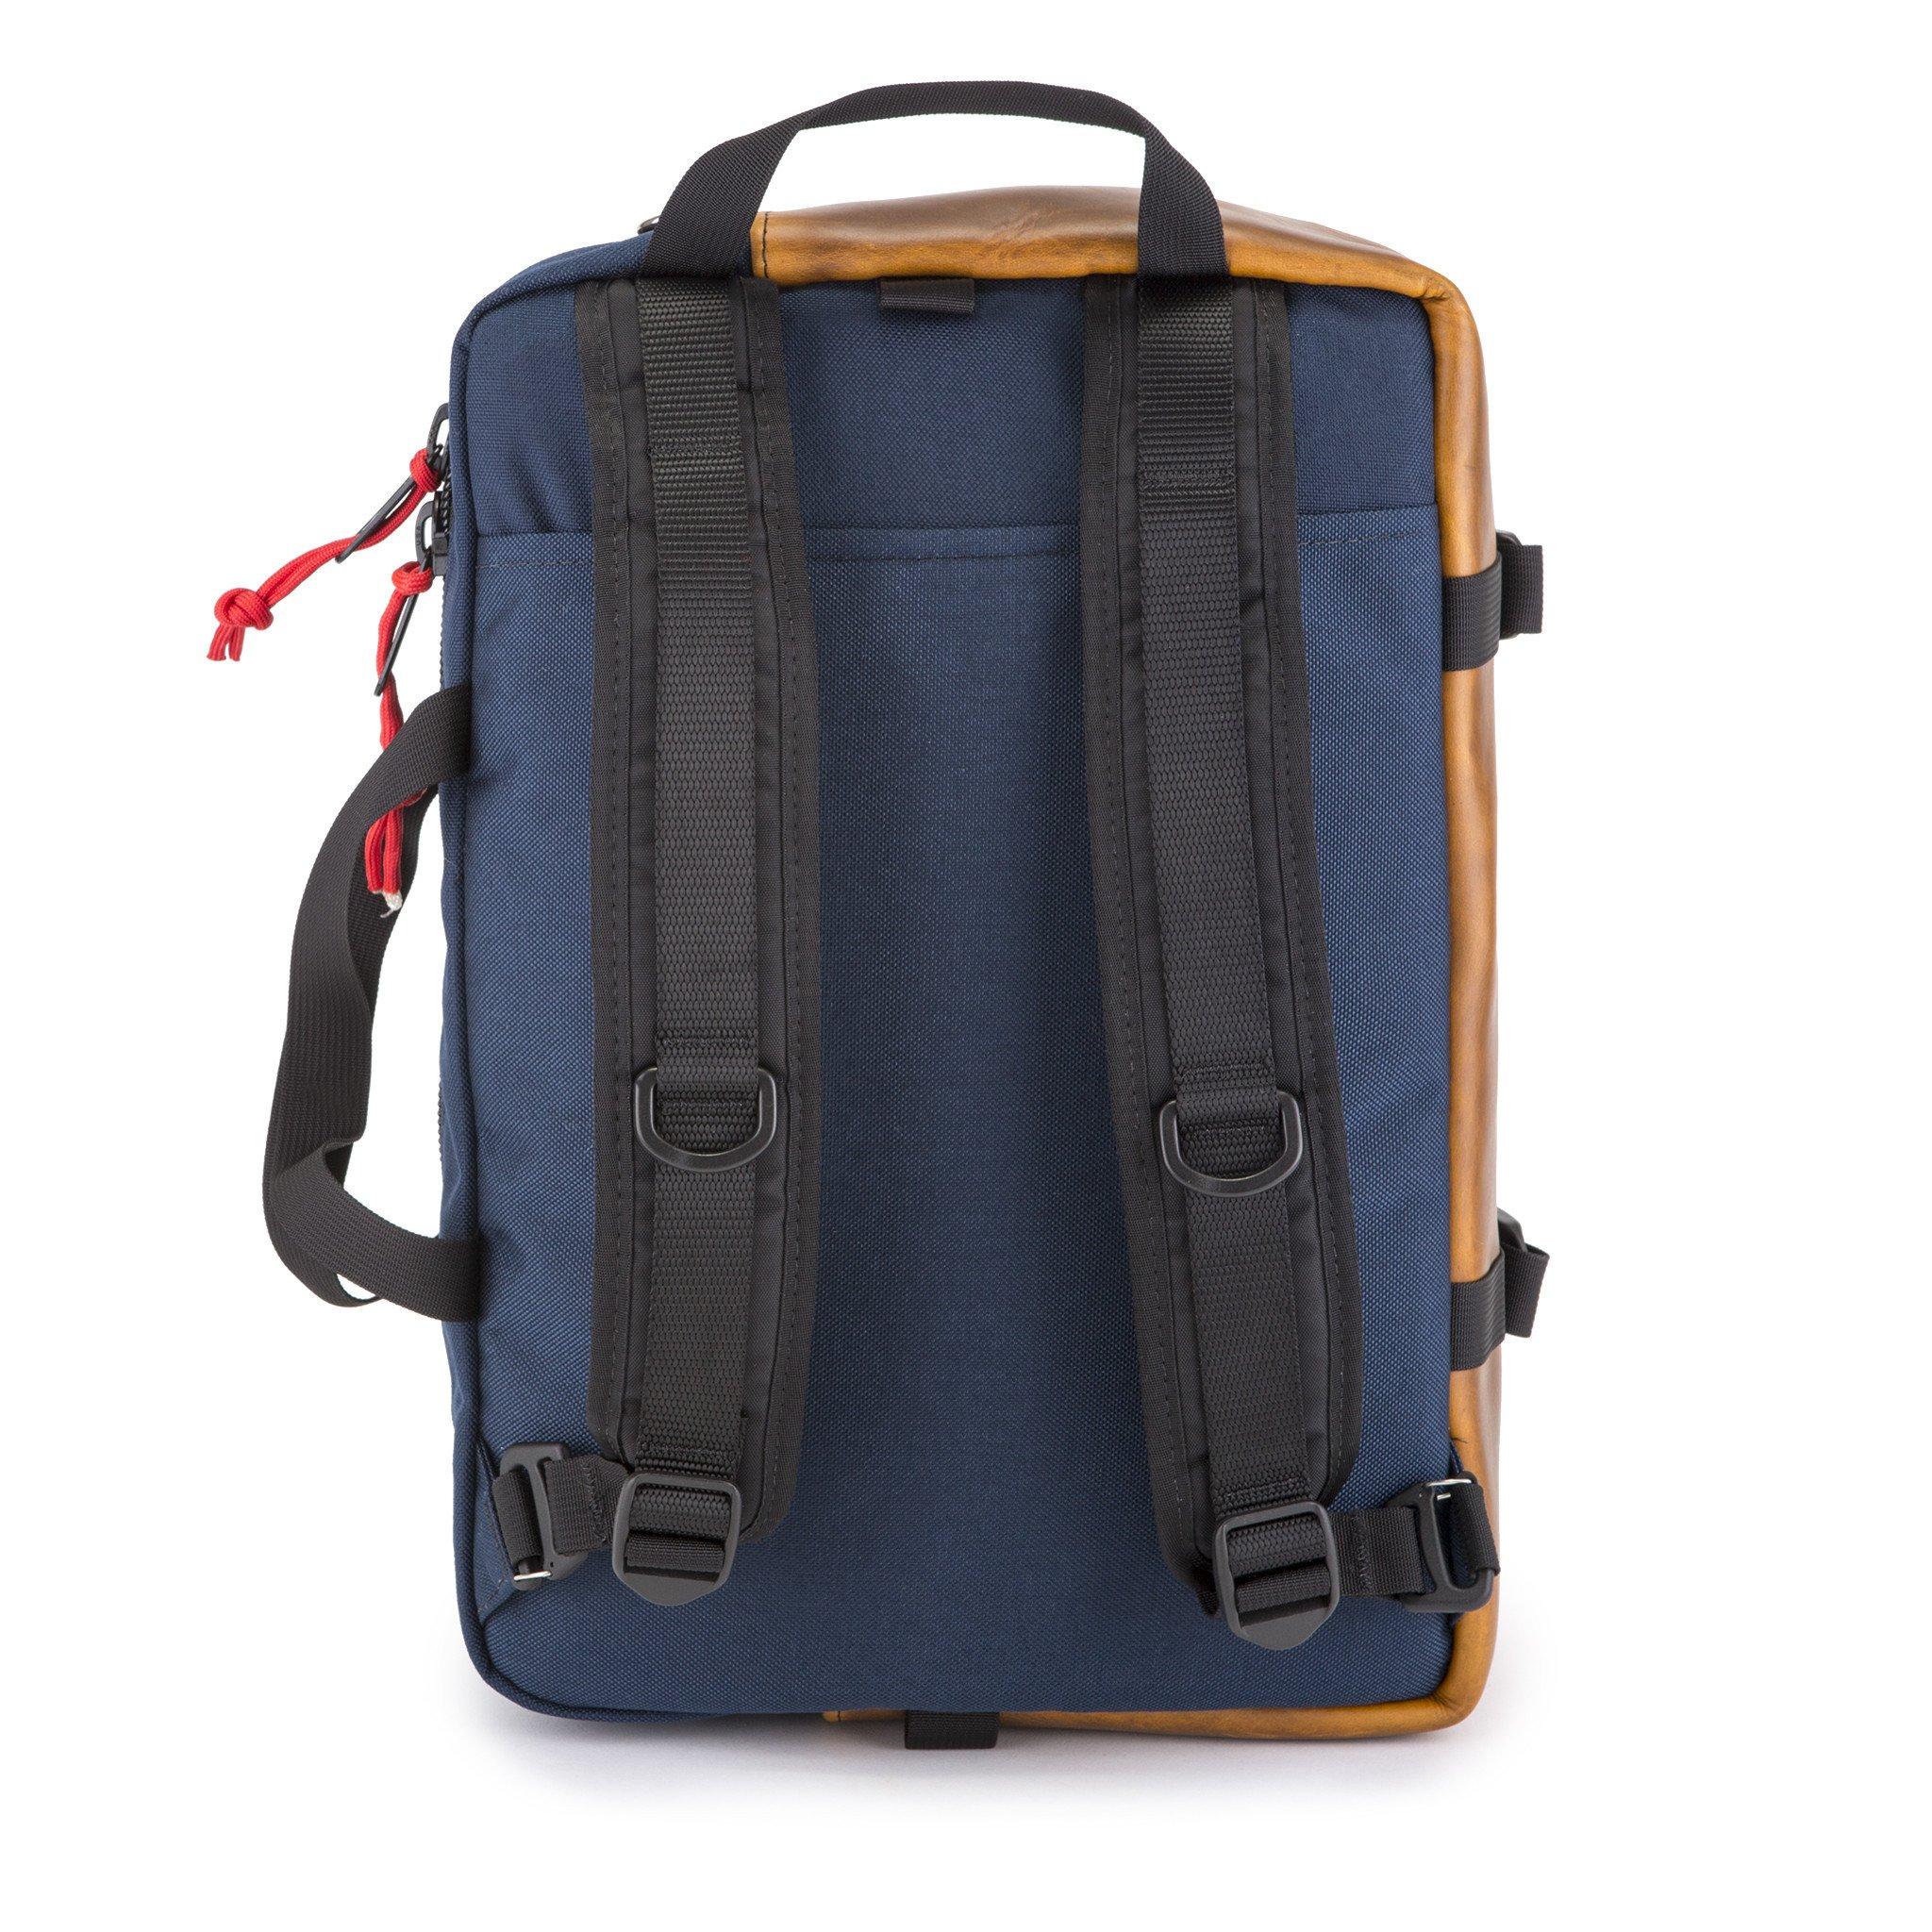 bags-mountain-briefcase-8_2048x2048.jpg